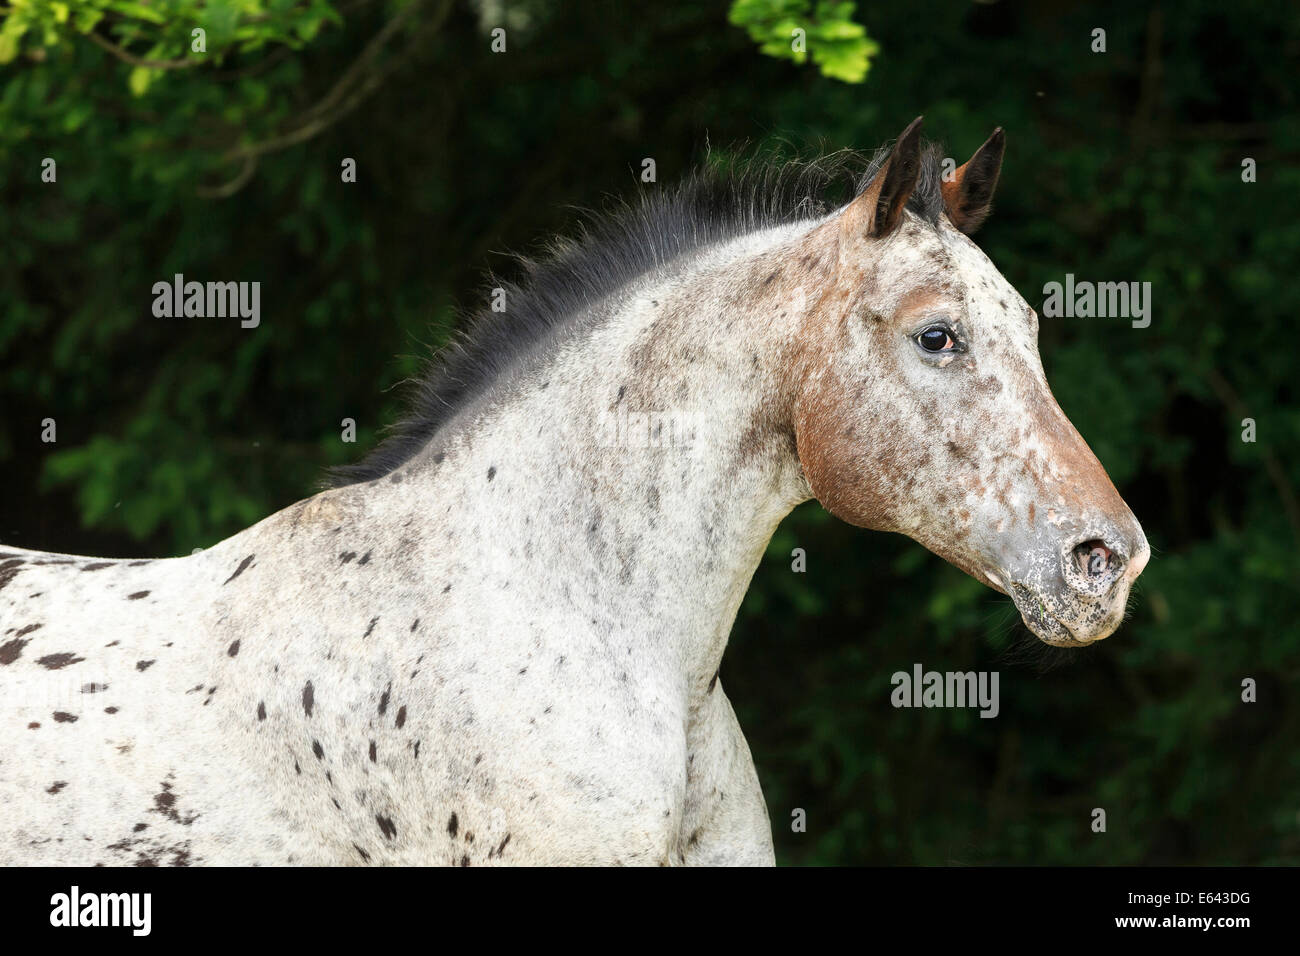 Appaloosa x Pura Raza Espanola  Portrait of a mare with